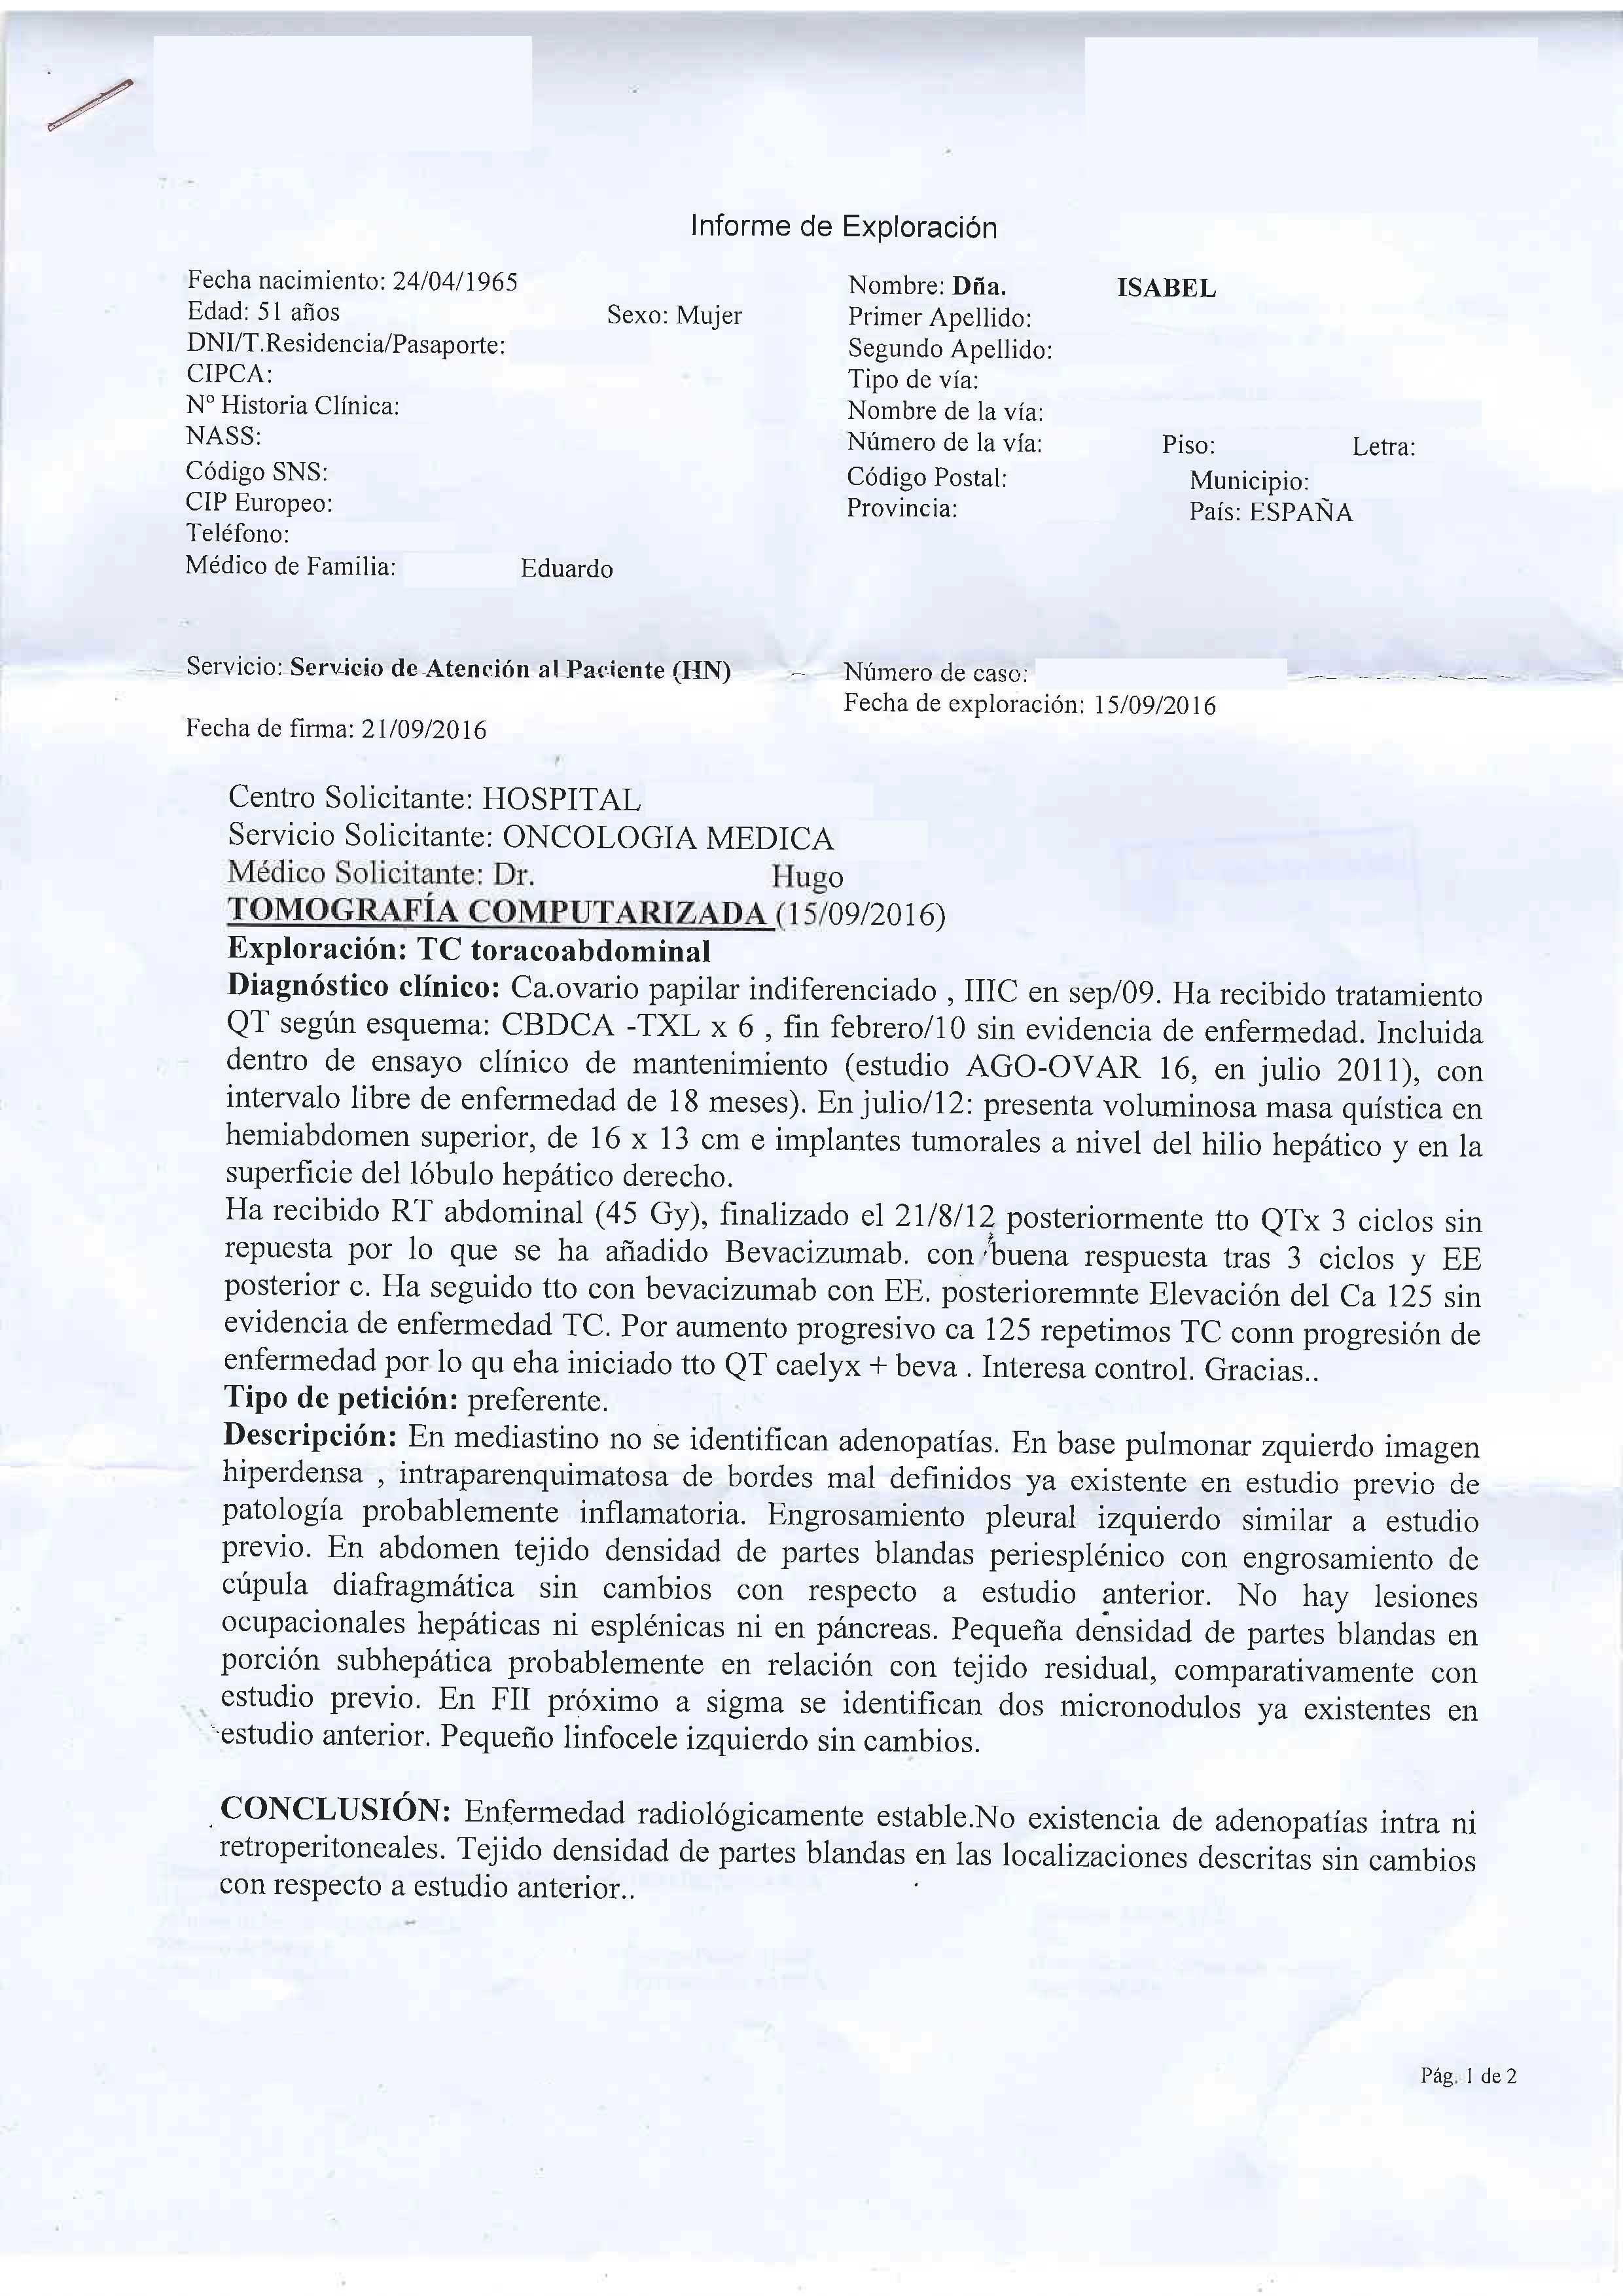 LifEscozul® - Isabel 1 - Cáncer de Ovarios